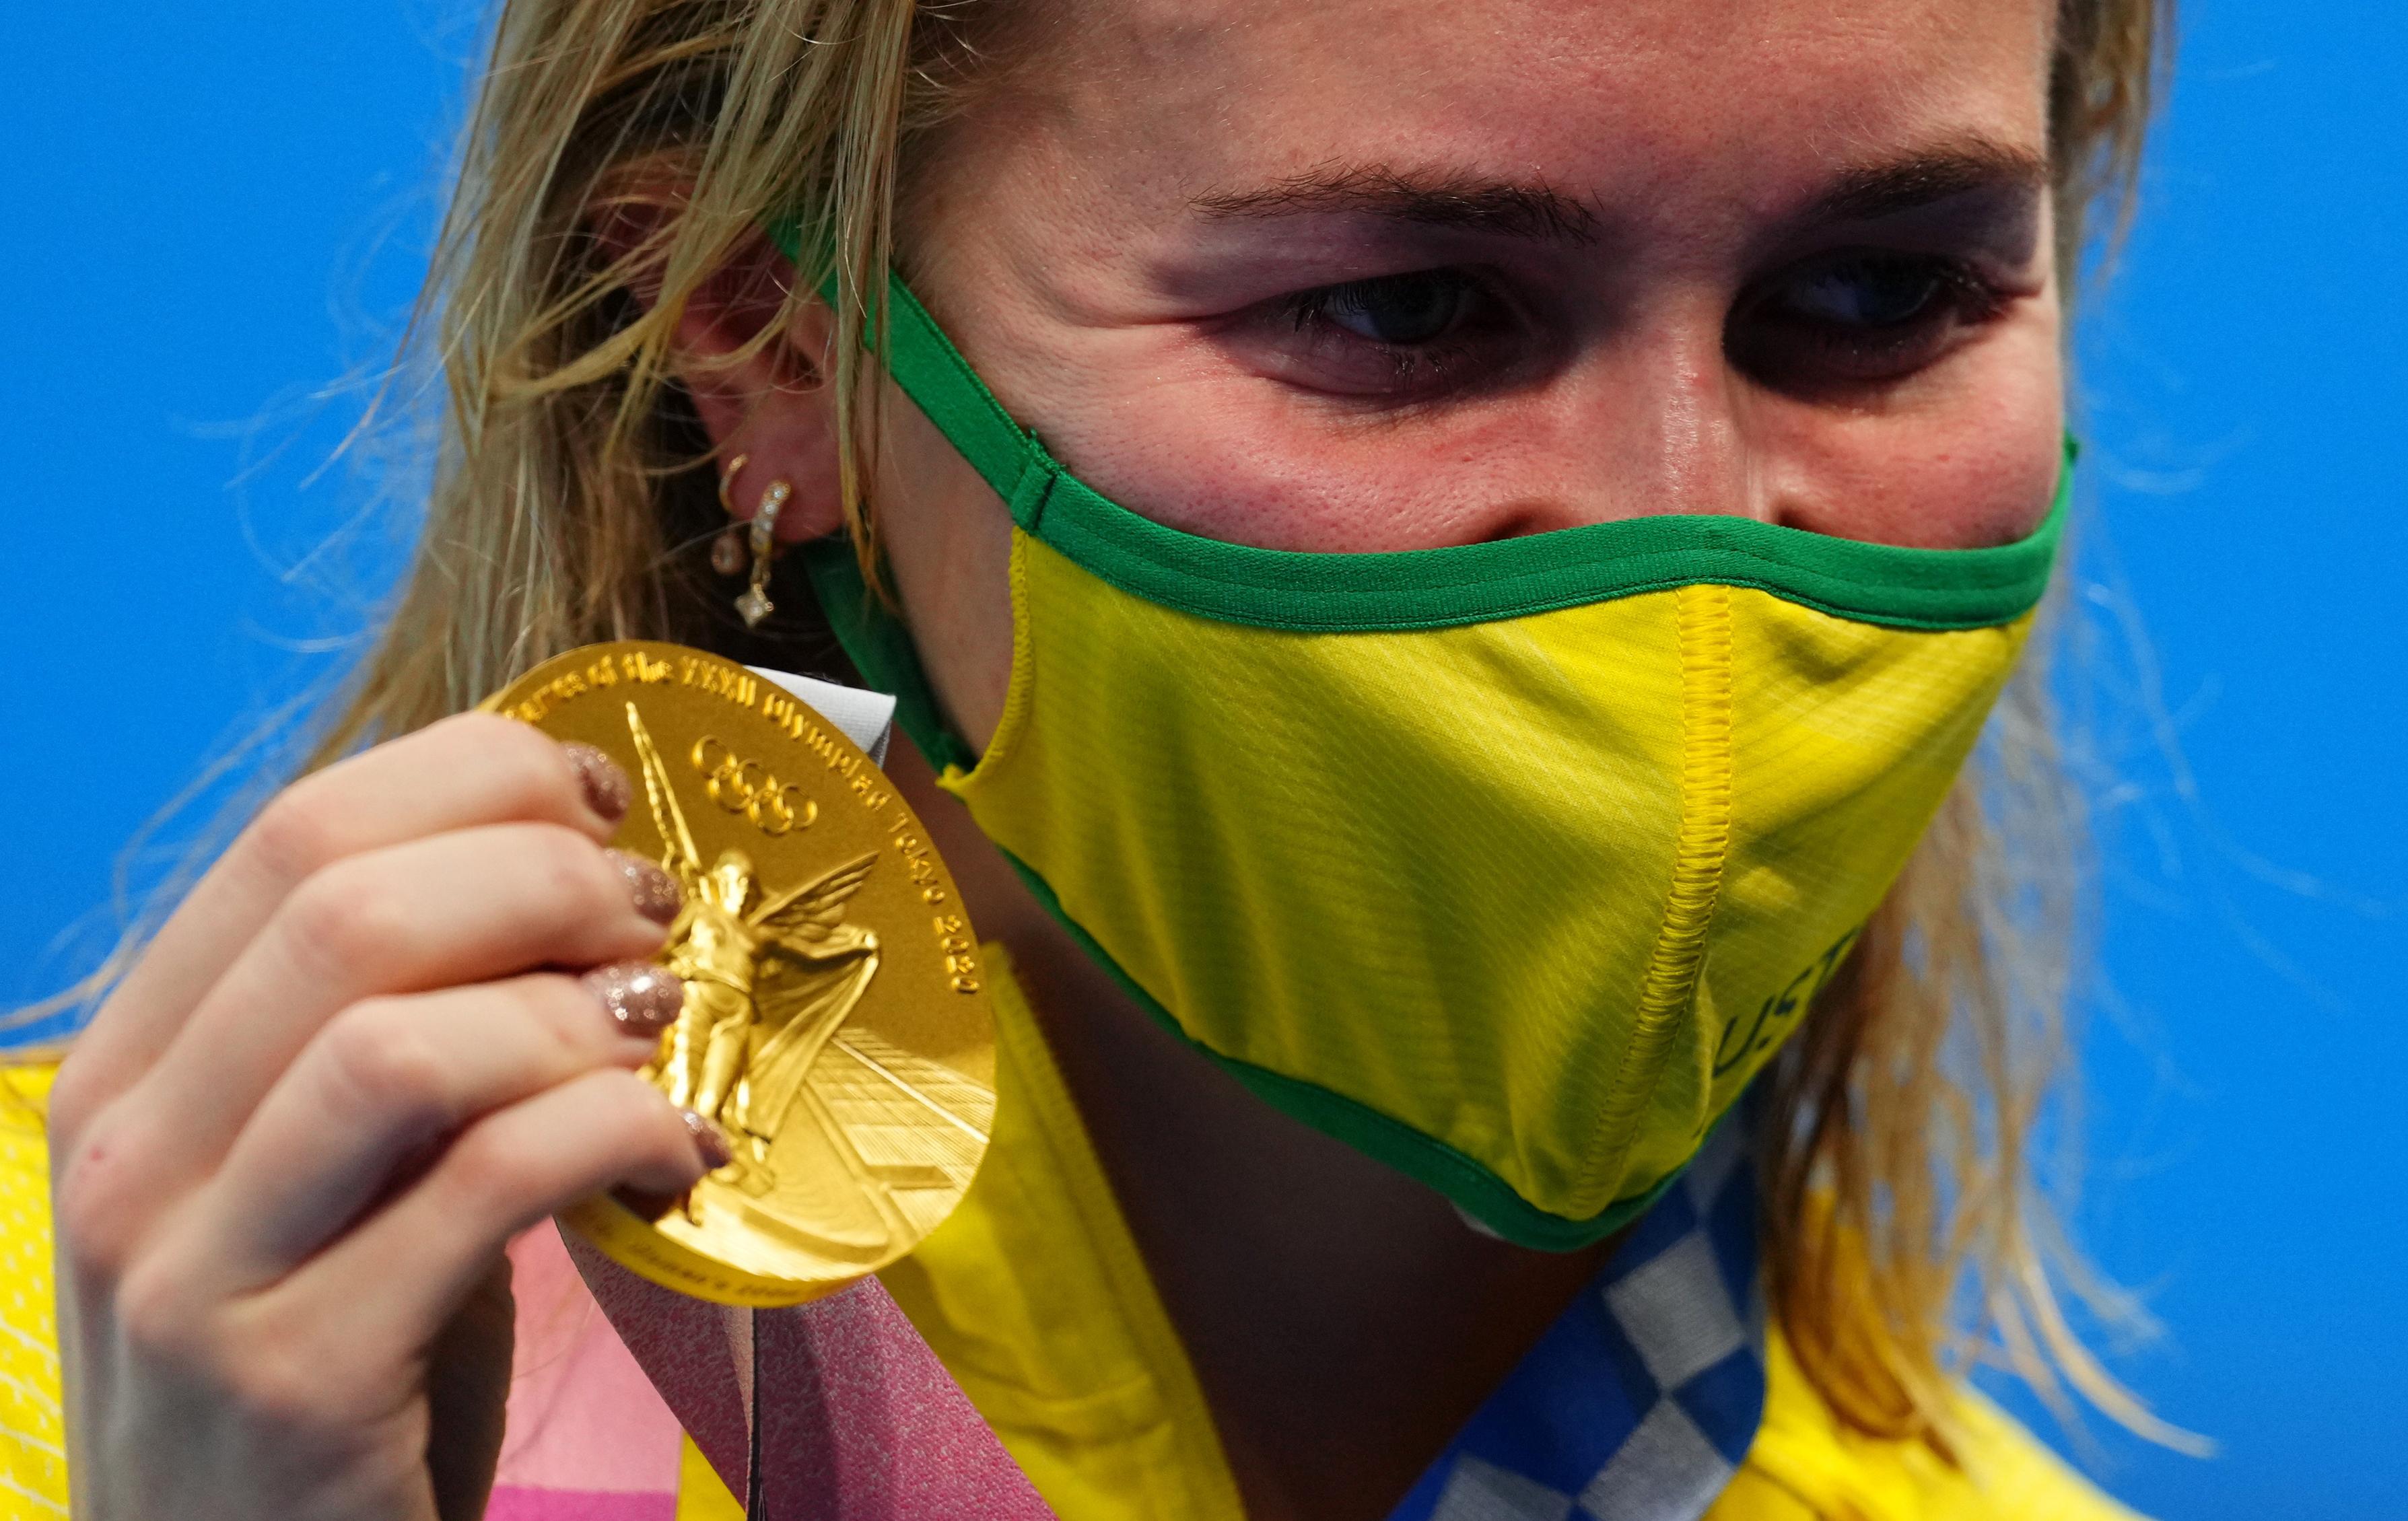 Tokyo 2020 Olympics - Swimming - Women's 200m Freestyle - Medal Ceremony - Tokyo Aquatics Centre - Tokyo, Japan - July 28, 2021. Ariarne Titmus of Australia poses with the gold medal REUTERS/Aleksandra Szmigiel